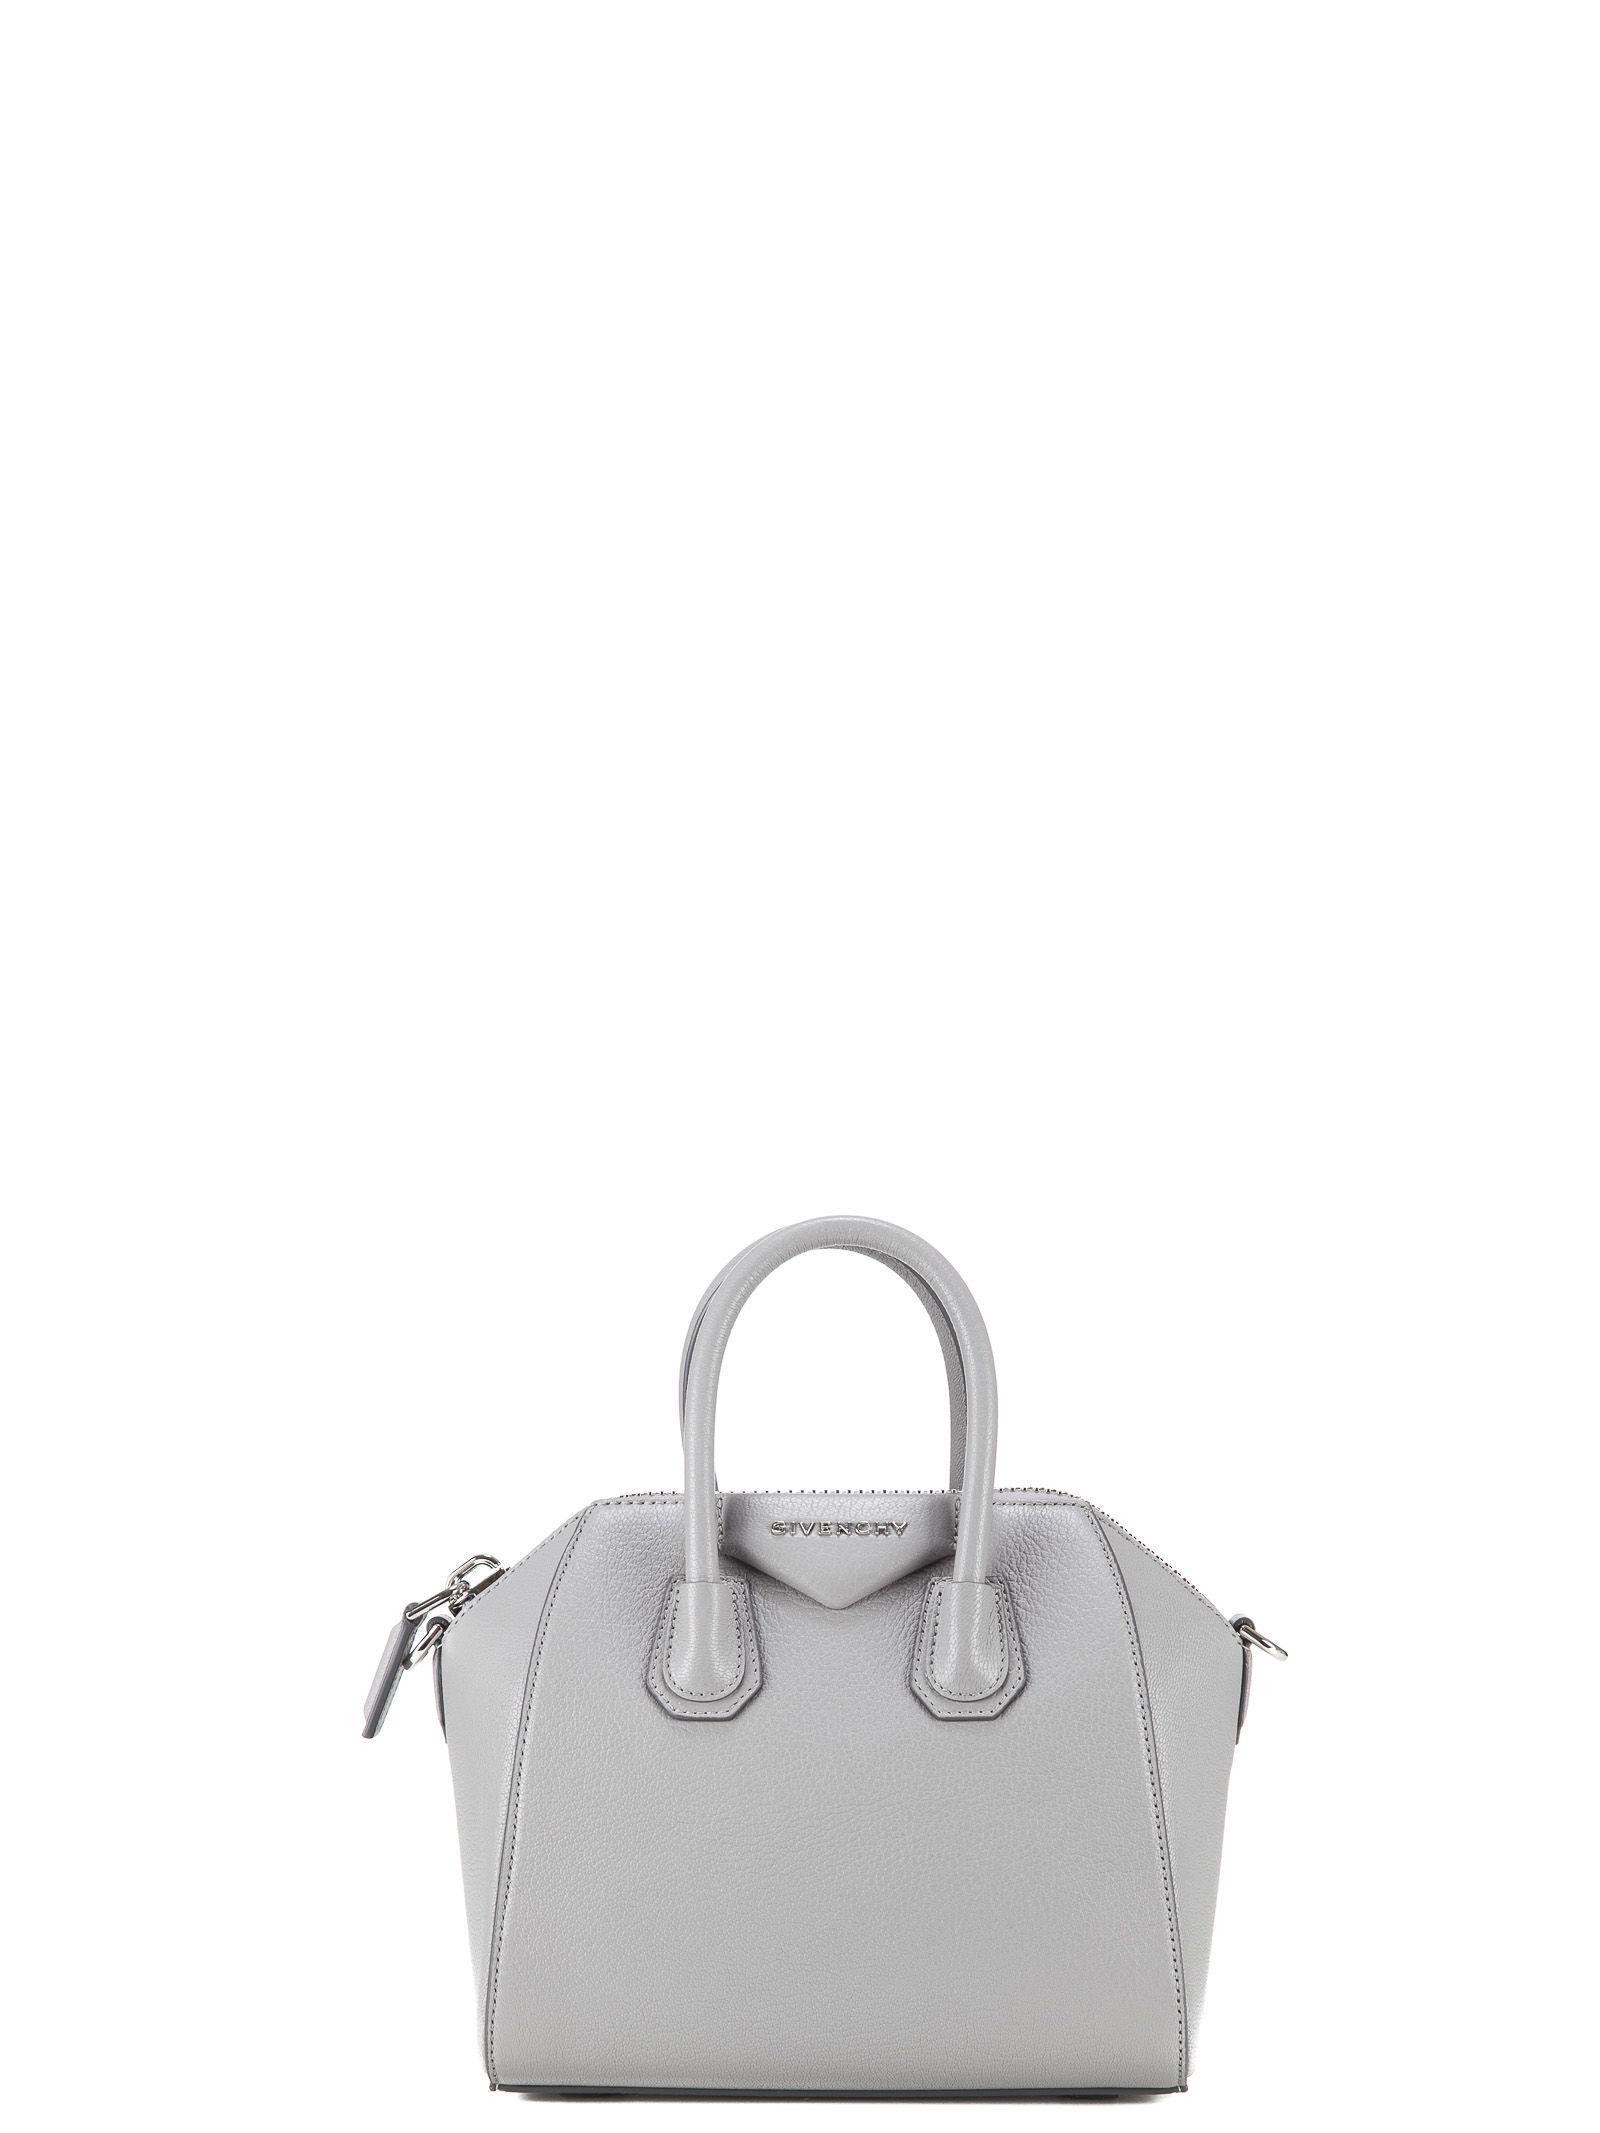 Givenchy Mini Antigona Tote In Grey